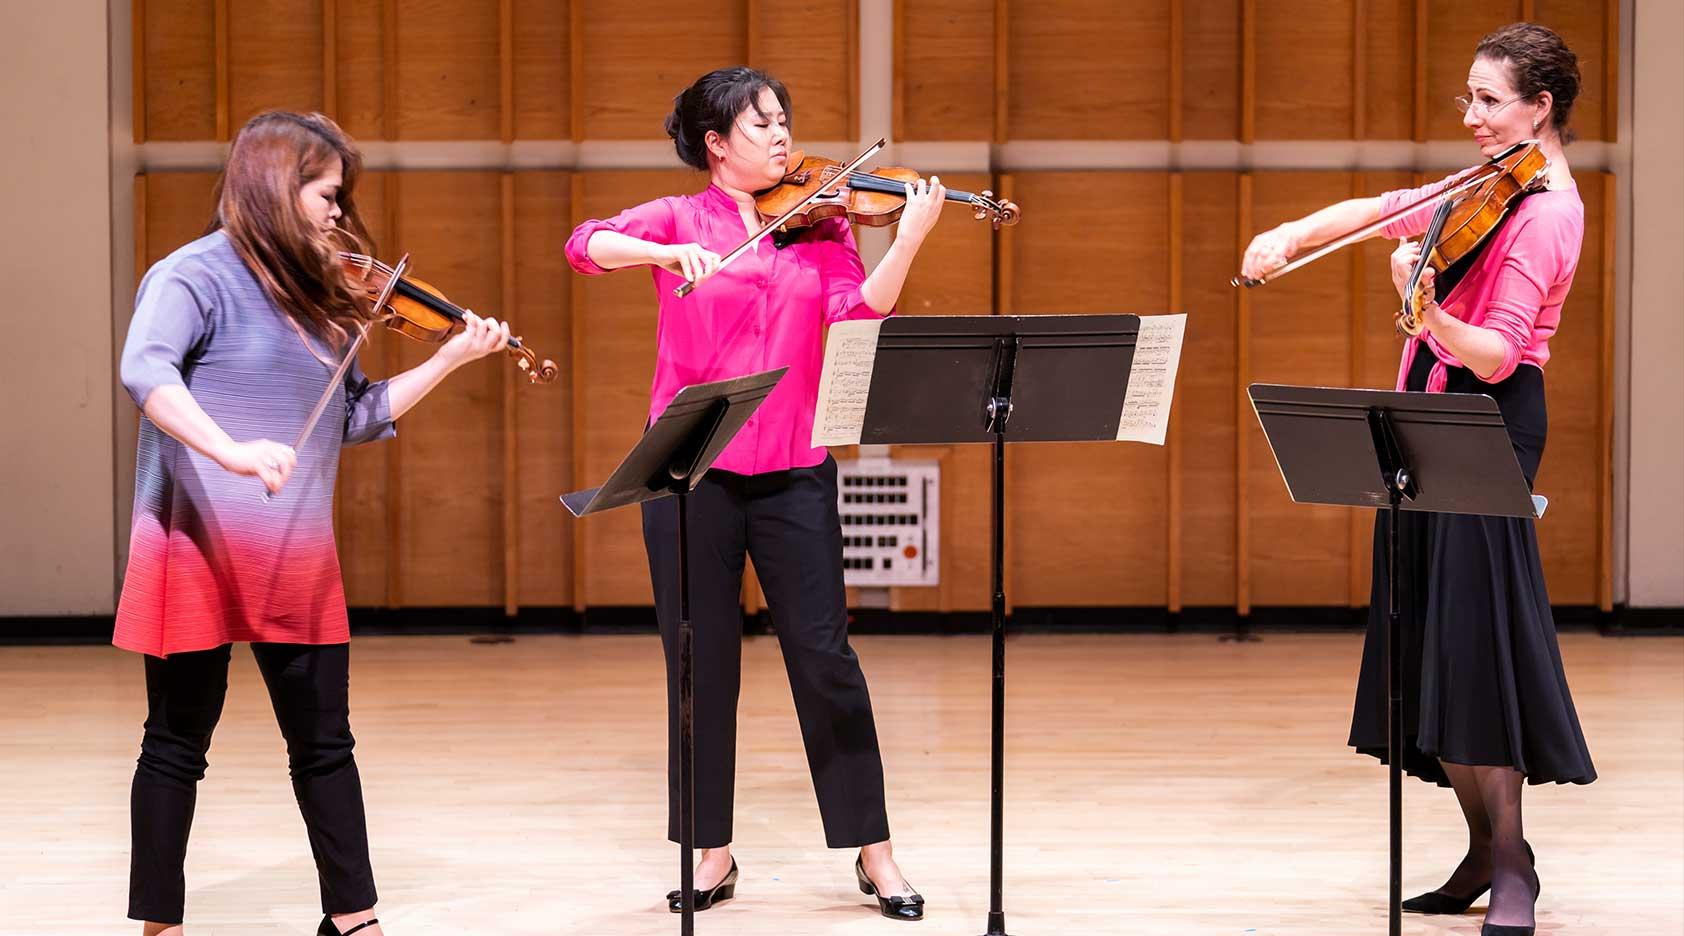 Philharmonic Ensembles at Merkin Hall